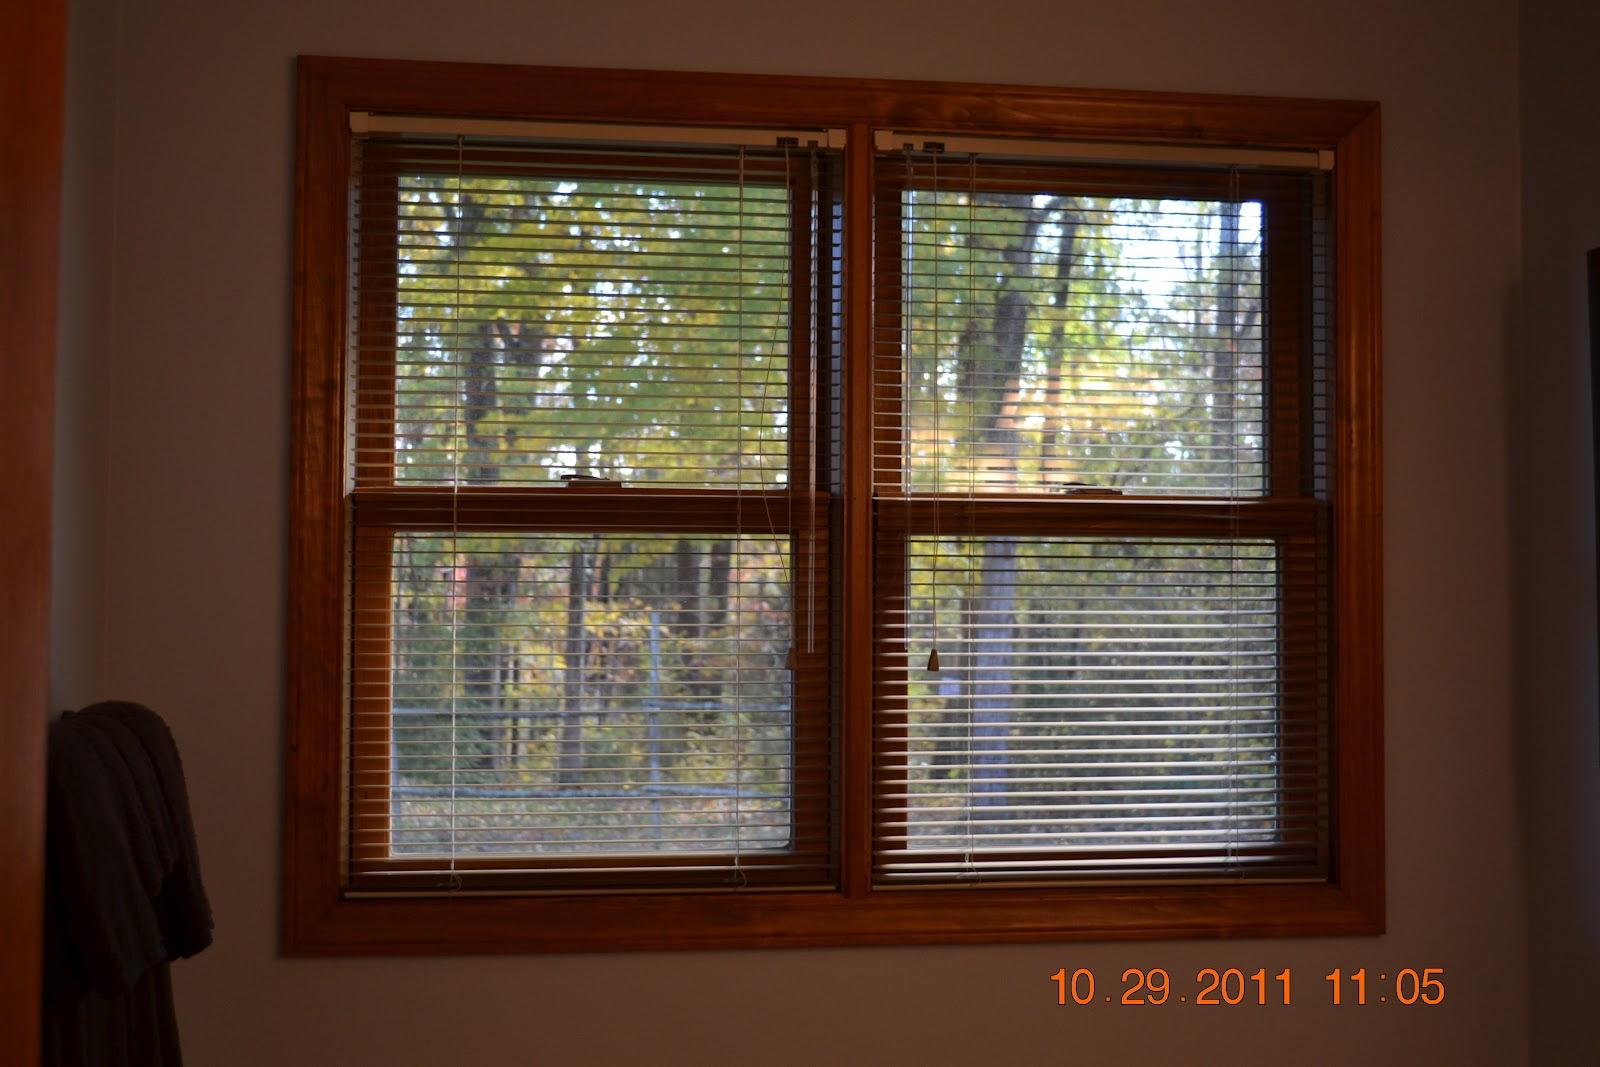 Debbie S Open Window Window Privacy With Style